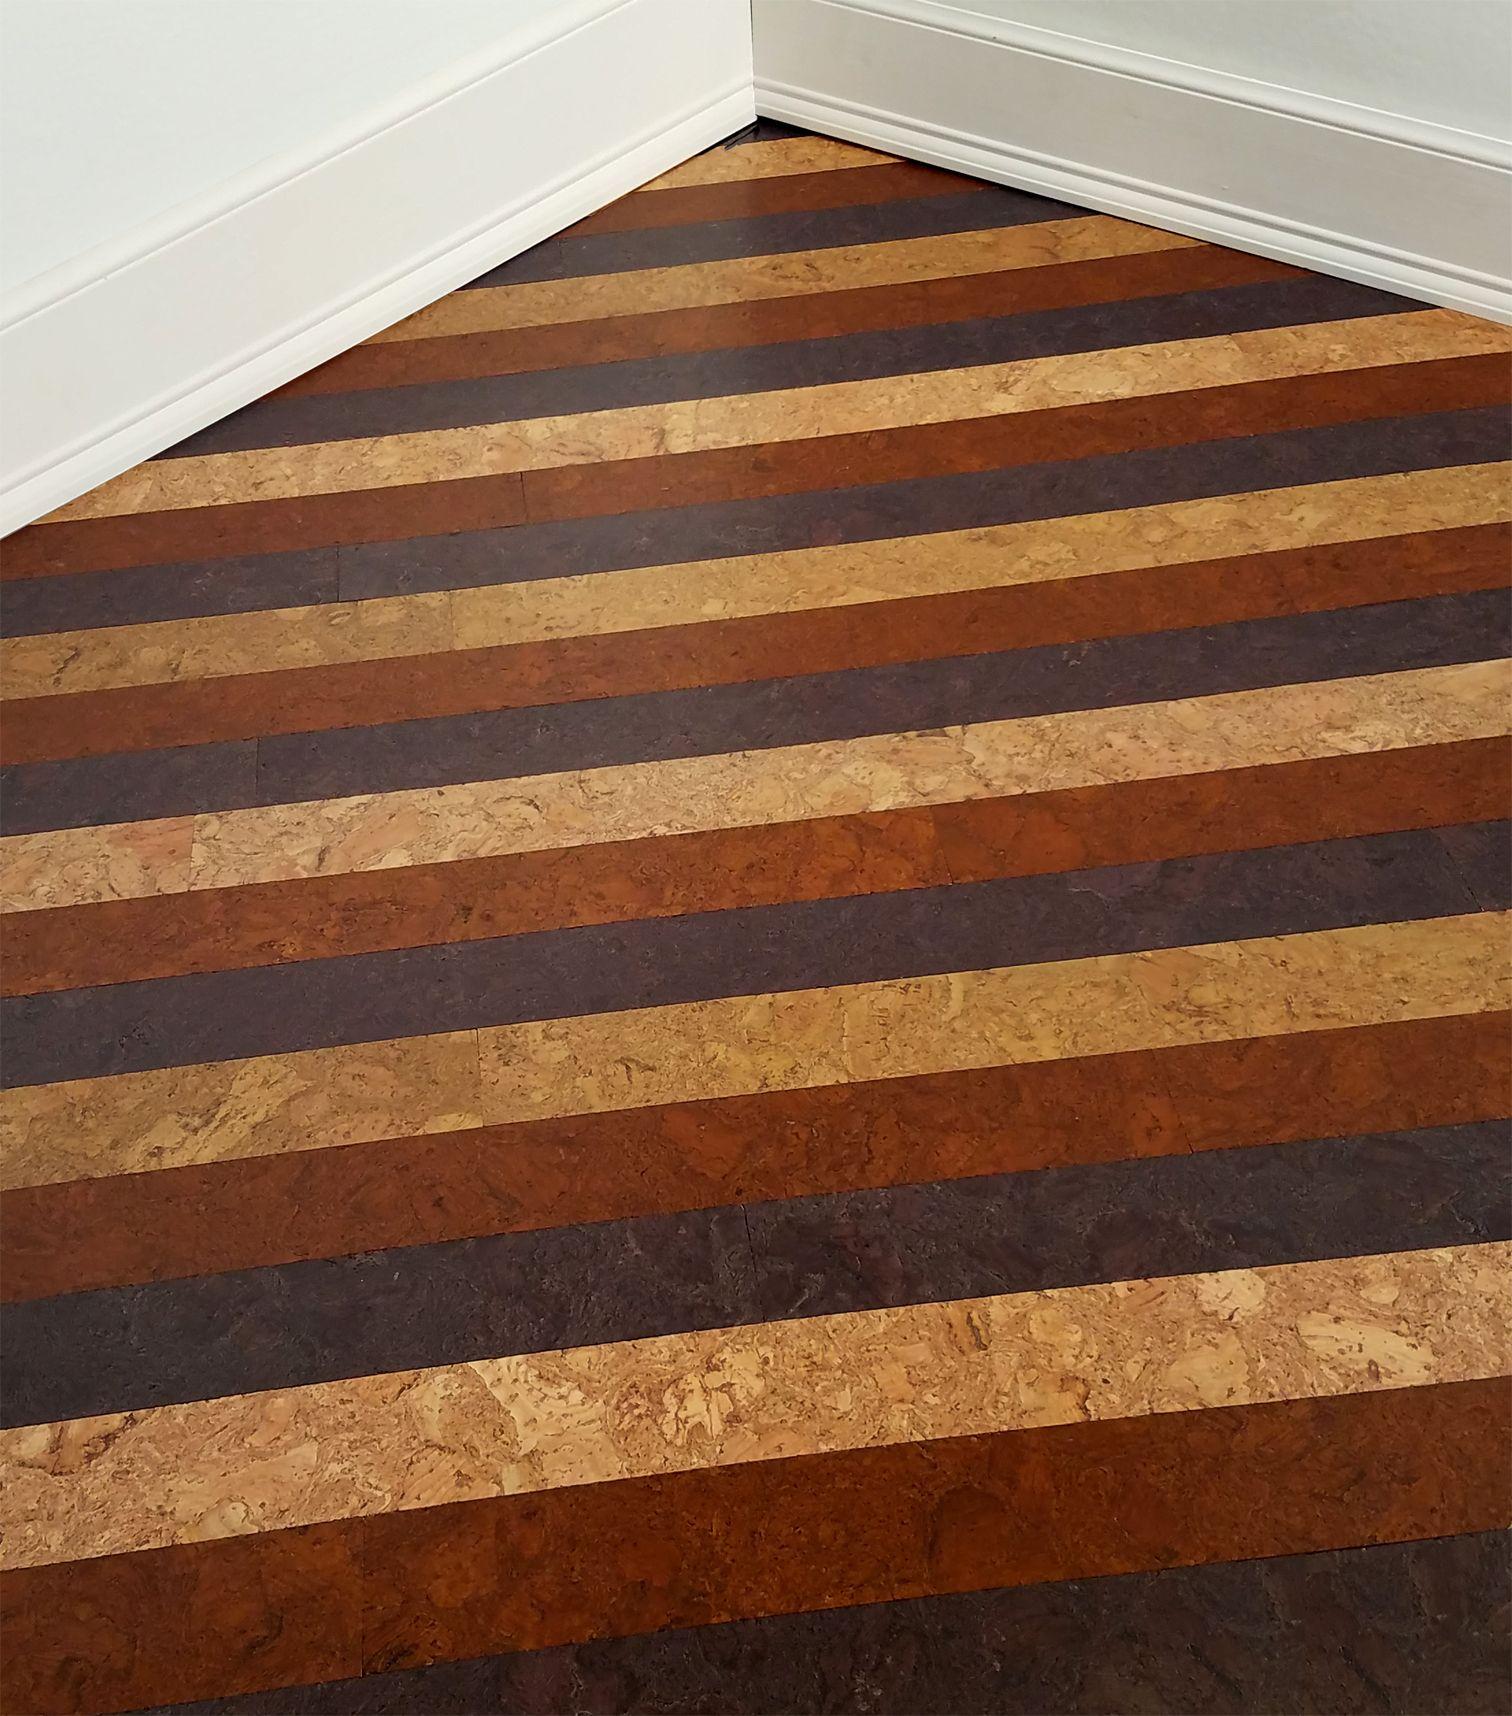 3 Steps 1 Beautiful New Wood Floor Our 100 Cork Strip Installation Is As Easy As Glue Stick Finish Visit Mycorkfloor Com To Get Cork Wall Tiles Diy Wood Floors Diy Flooring